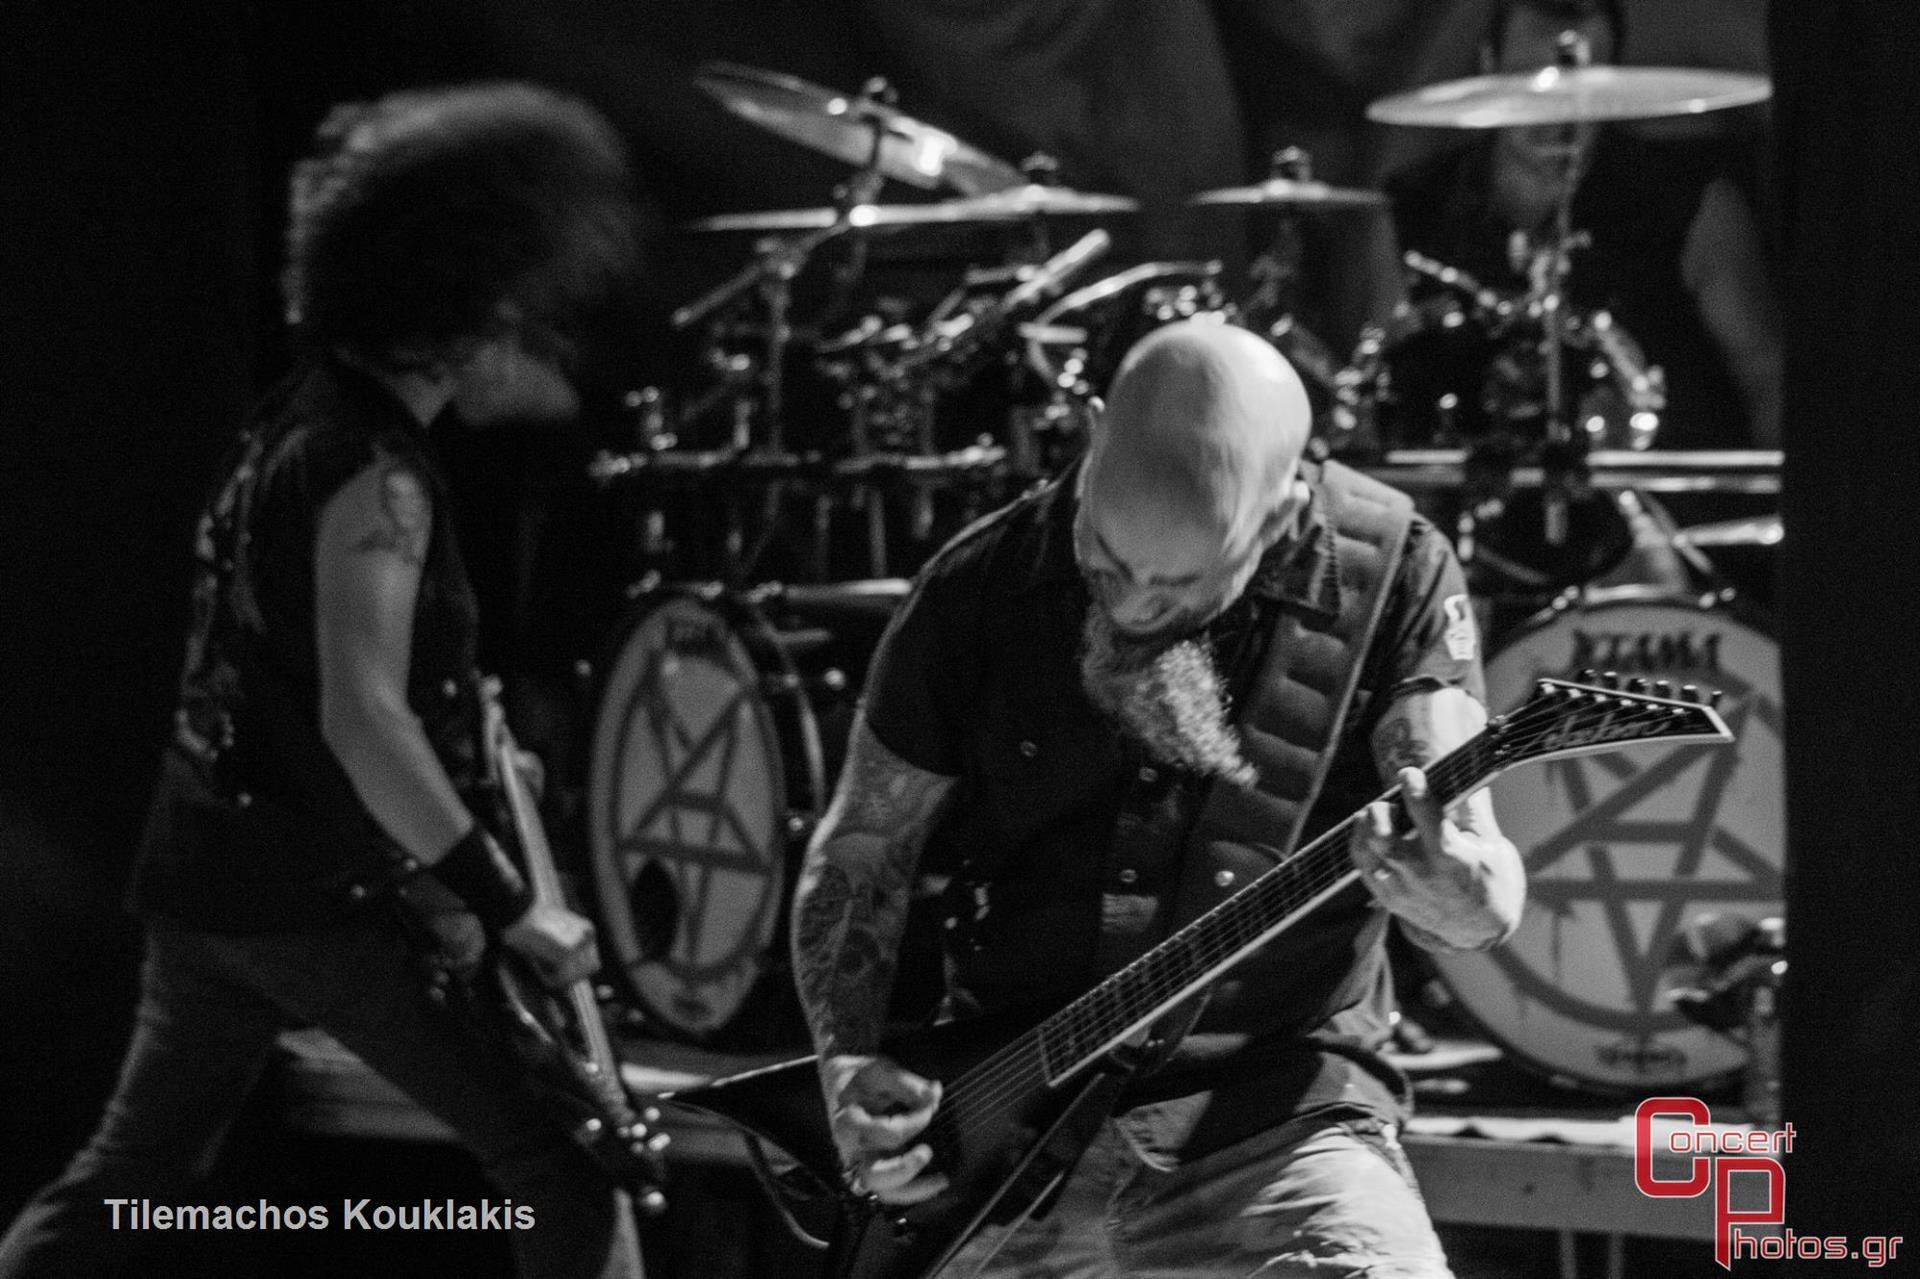 Anthrax-Anthrax photographer: Tilemachos Kouklakis - IMG_2063